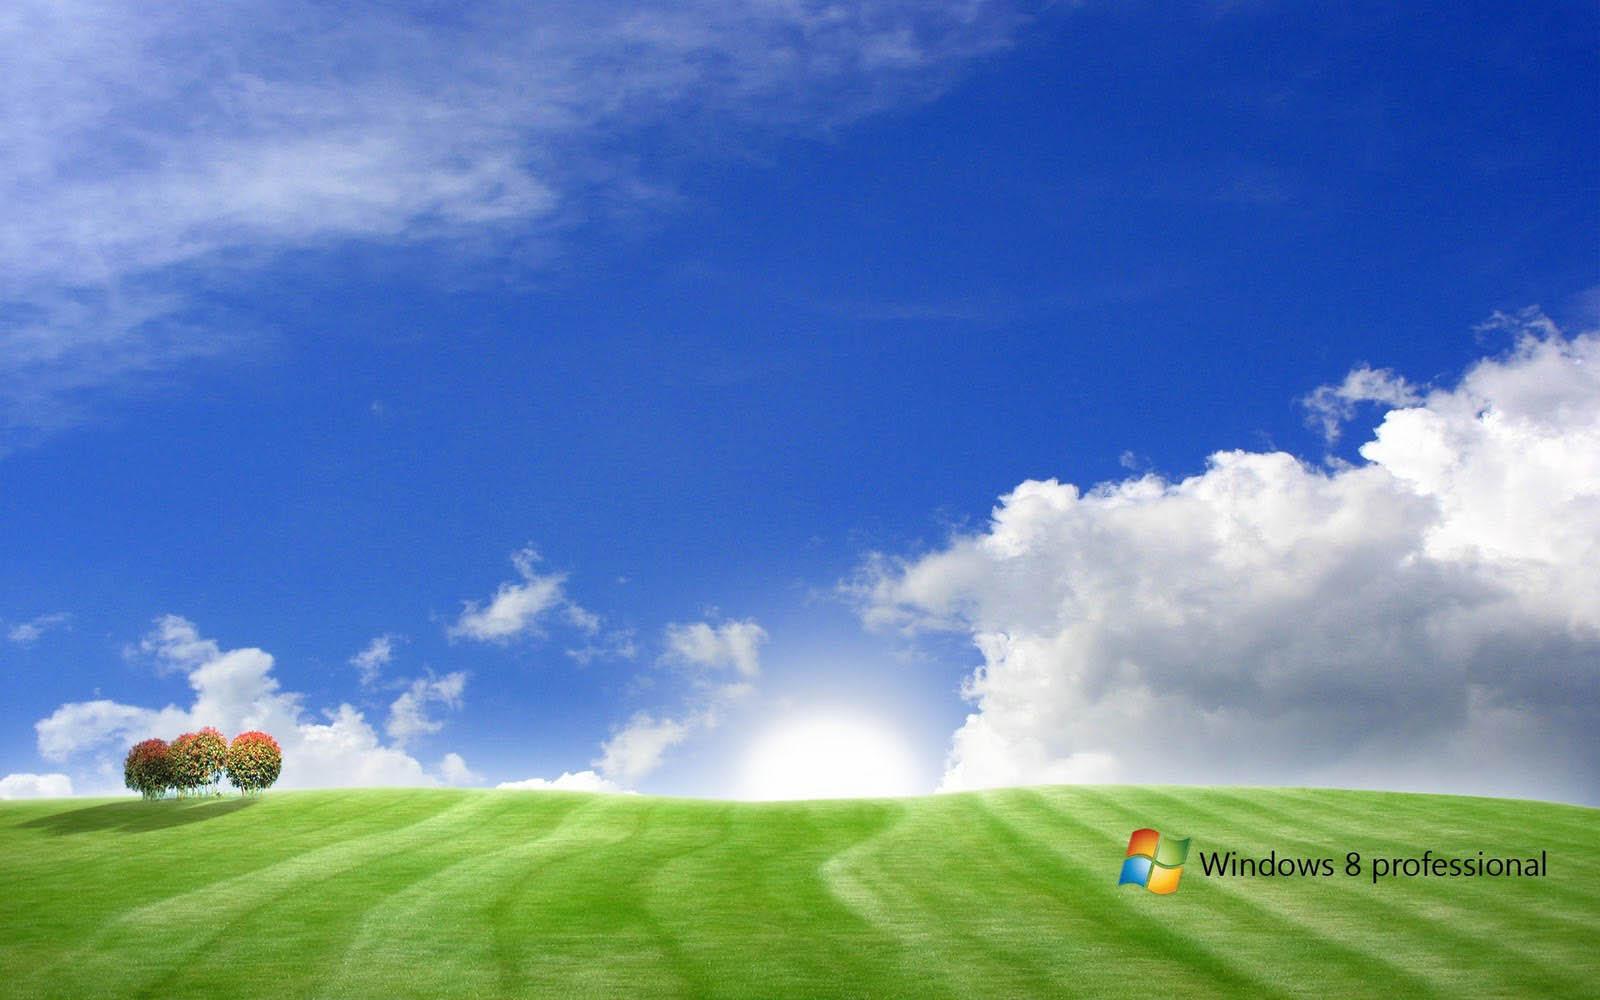 http://1.bp.blogspot.com/-sQefGE64loQ/UJUR5JX1MJI/AAAAAAAANO0/CD2zR7goxO8/s1600/Windows+8+Backgrounds+8.jpg